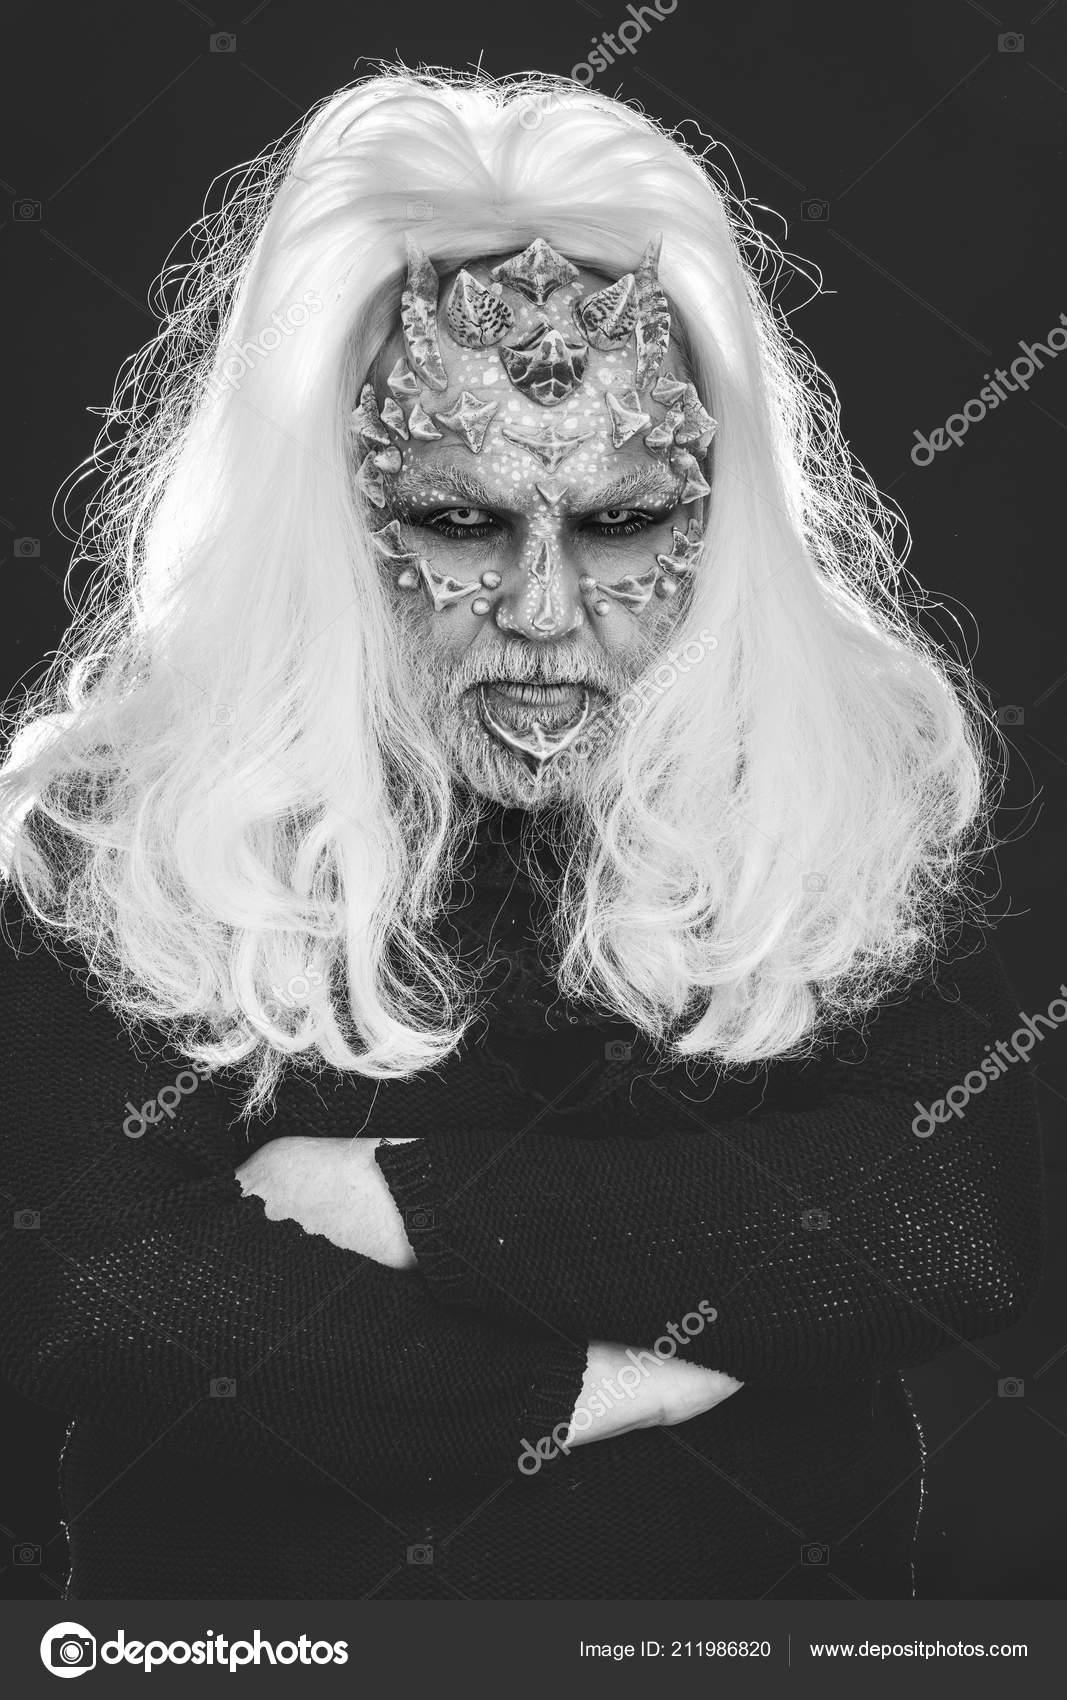 5565e60ac24d Άνθρωπος με δέρμα ερπετών και μεγάλη γκρίζα μαλλιά — Φωτογραφία ...